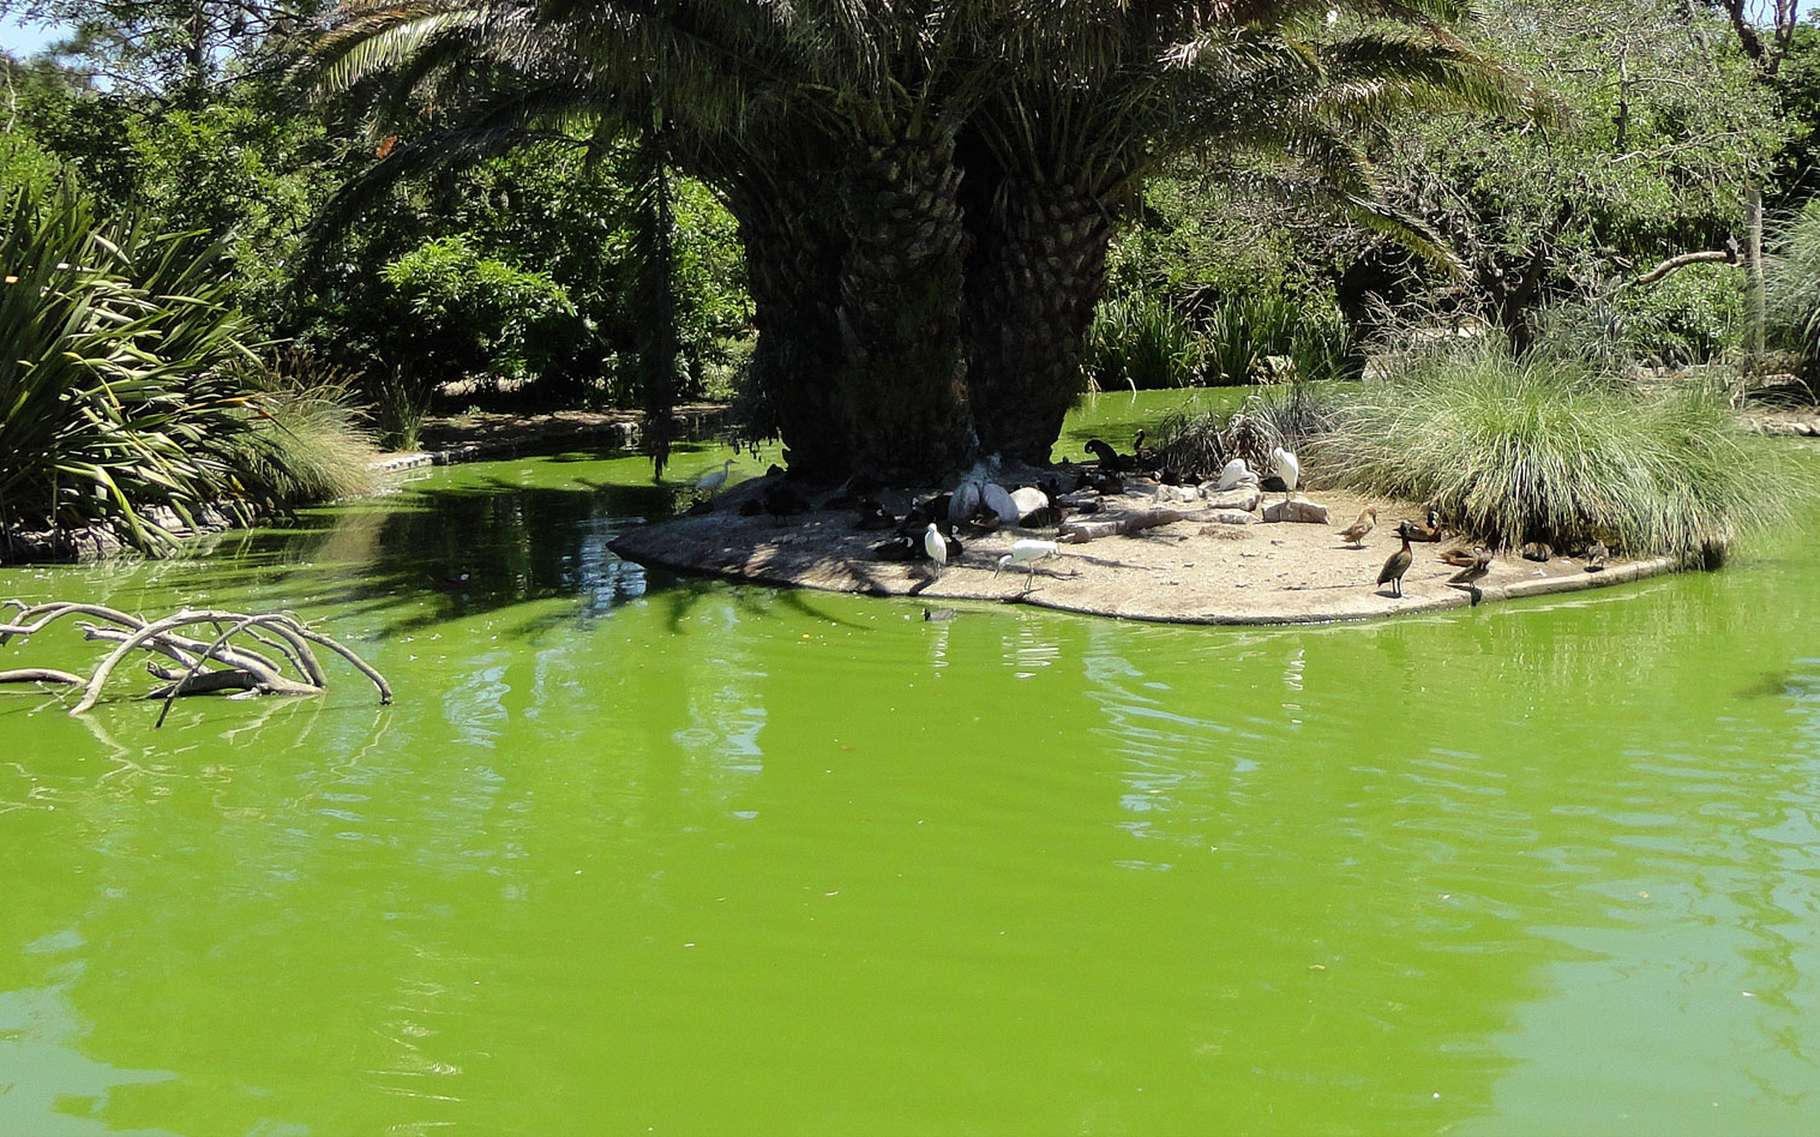 Bassin De Jardin : Quelles Dimensions ? | Dossier concernant Bassin De Jardin Préformé Grande Taille